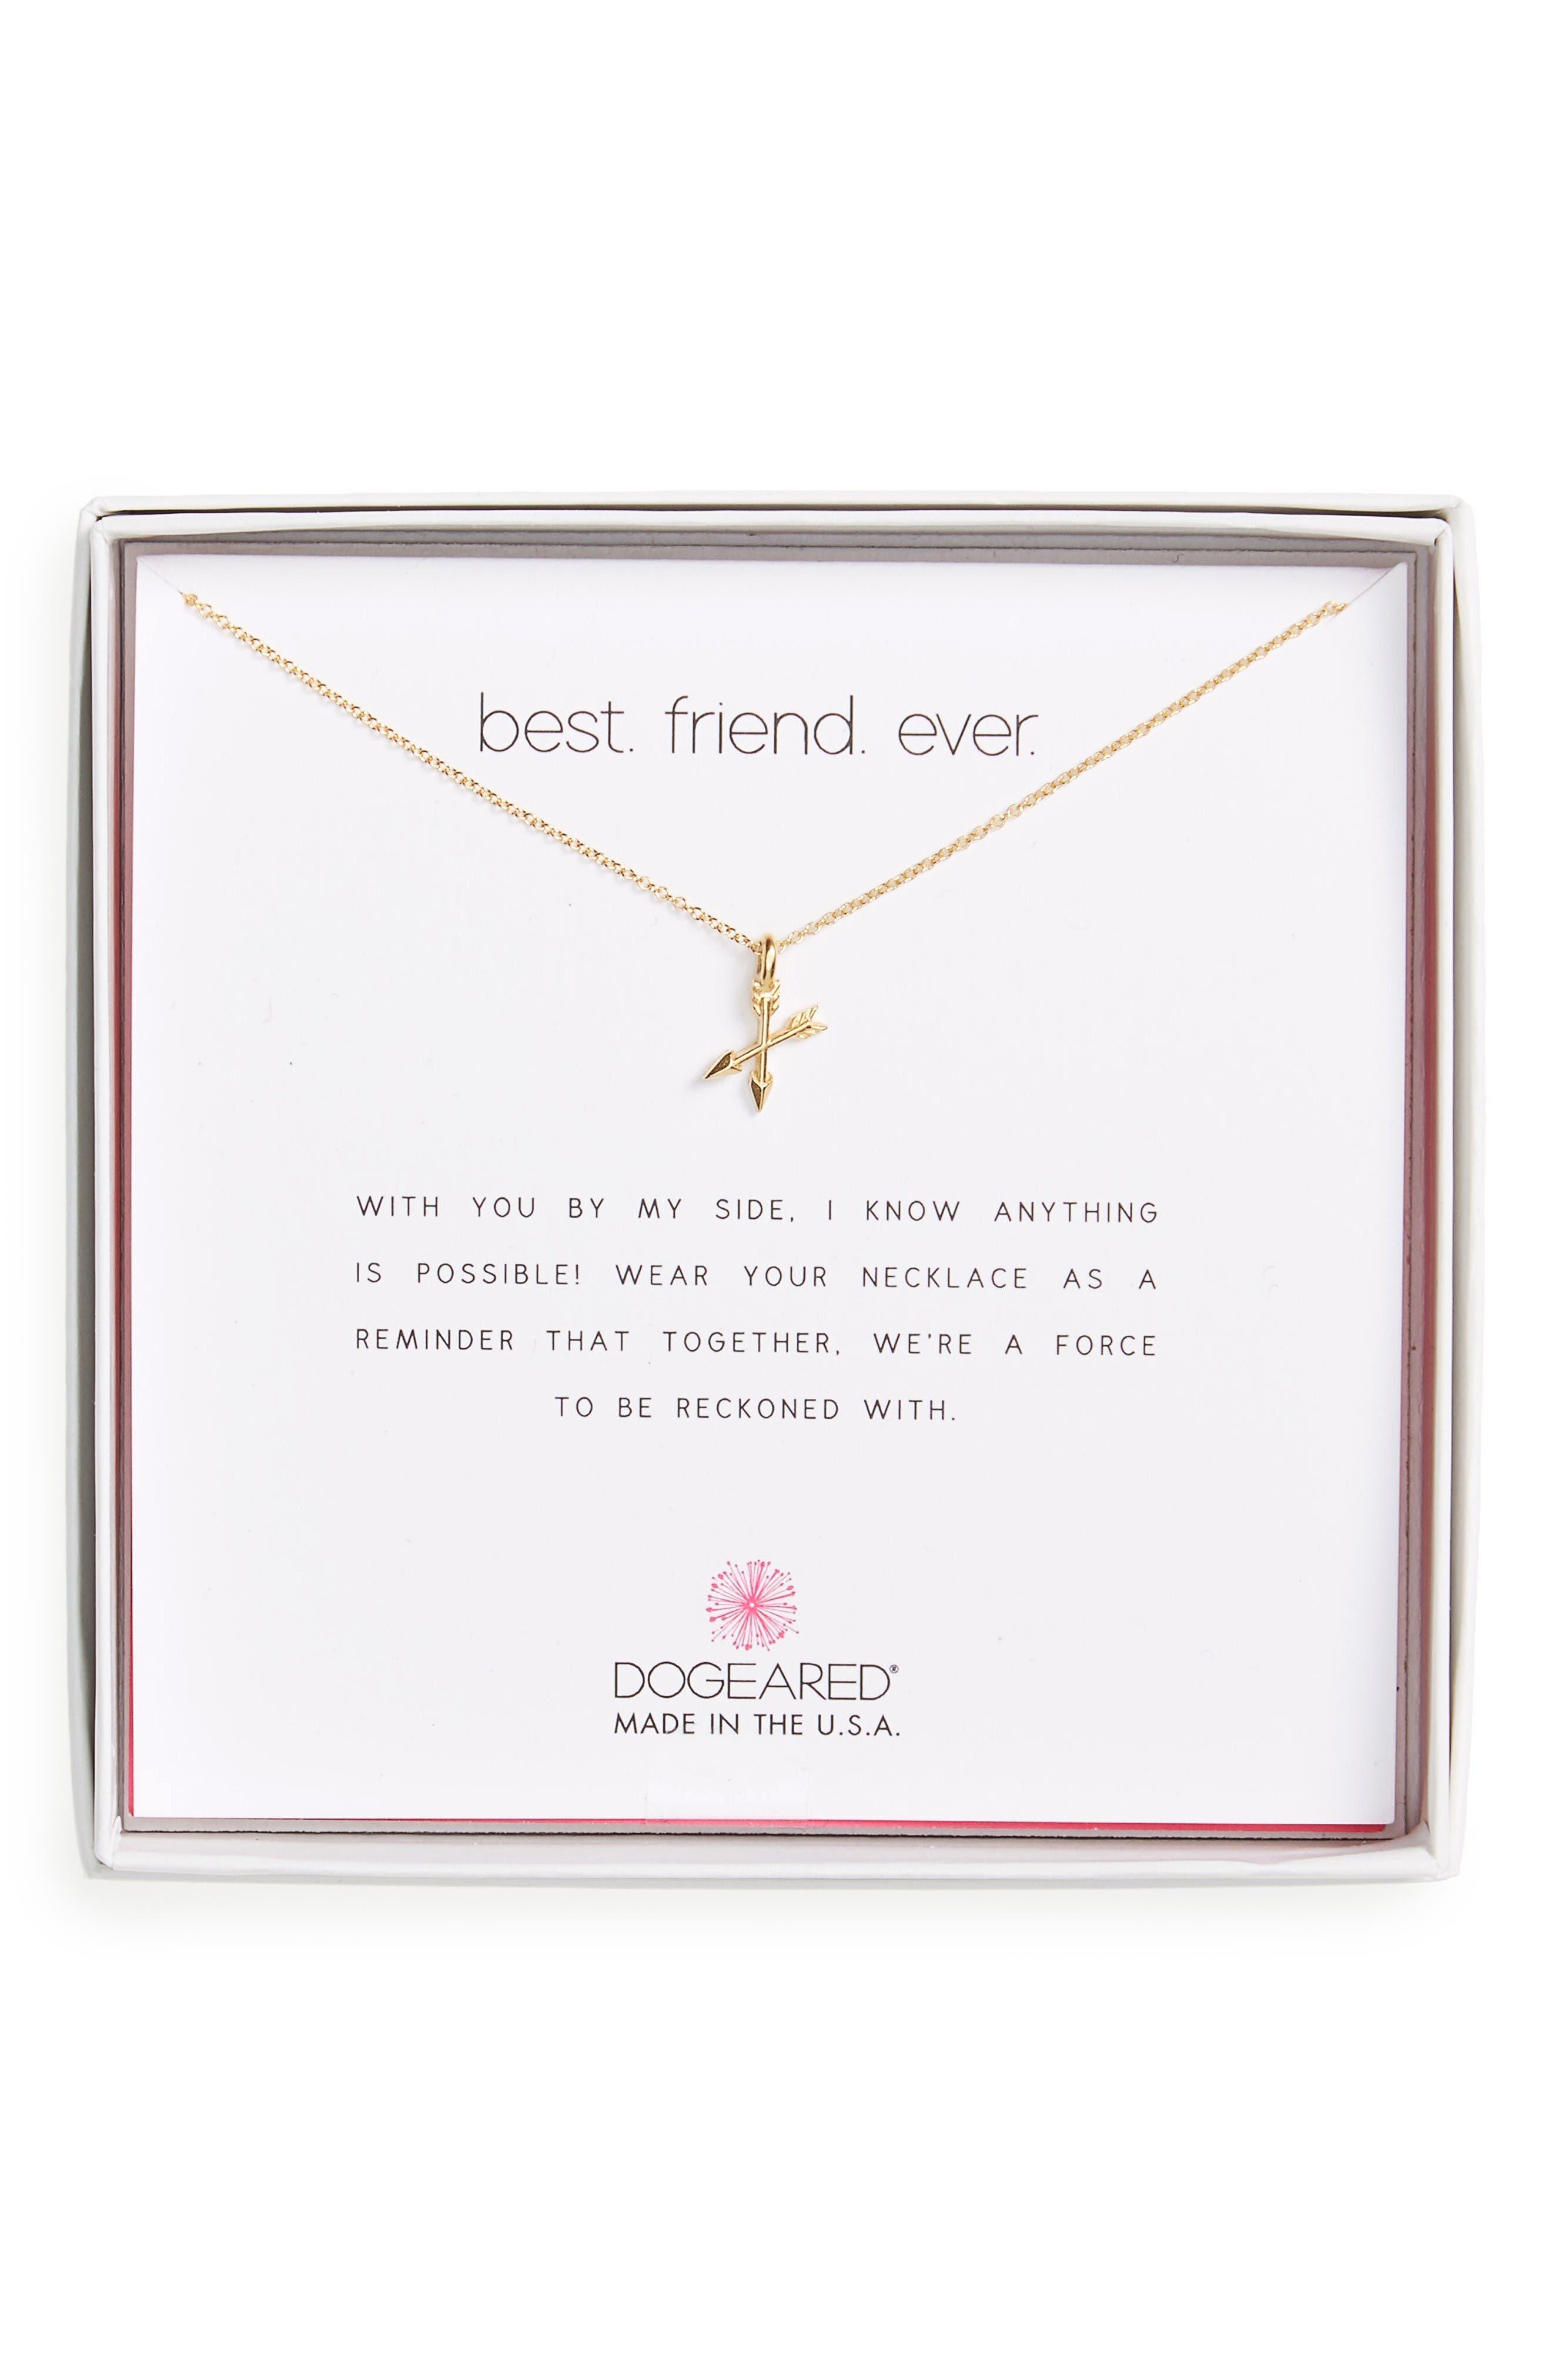 Dogeared Best Friend Ever Pendant Necklace